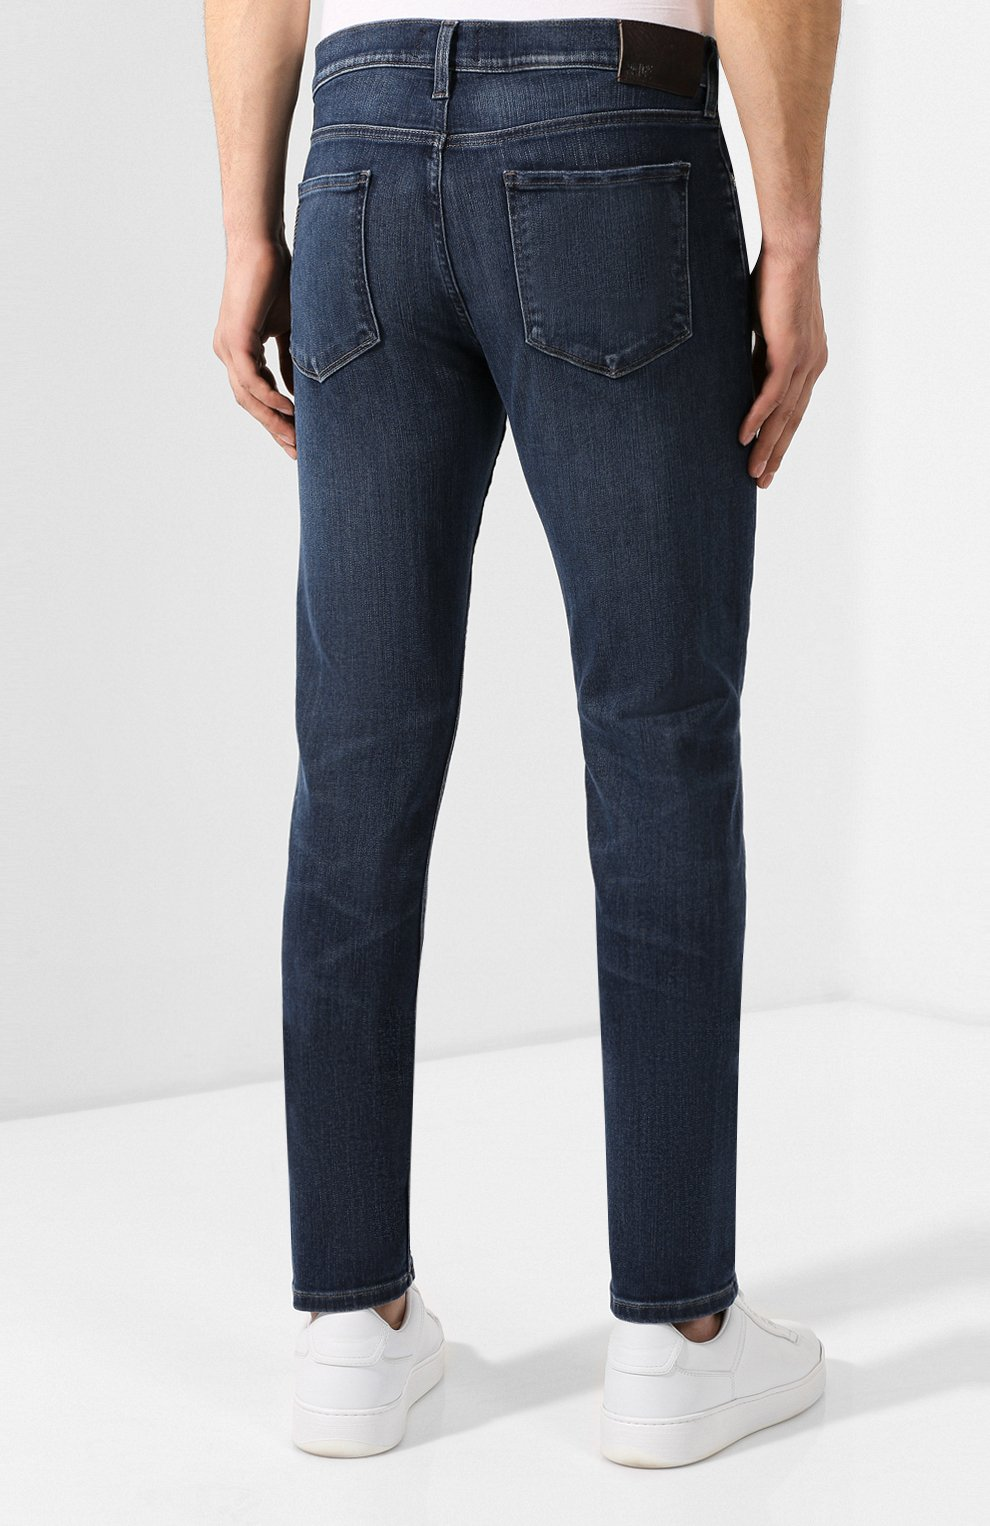 Мужские джинсы PAIGE синего цвета, арт. M653C72-7156 | Фото 4